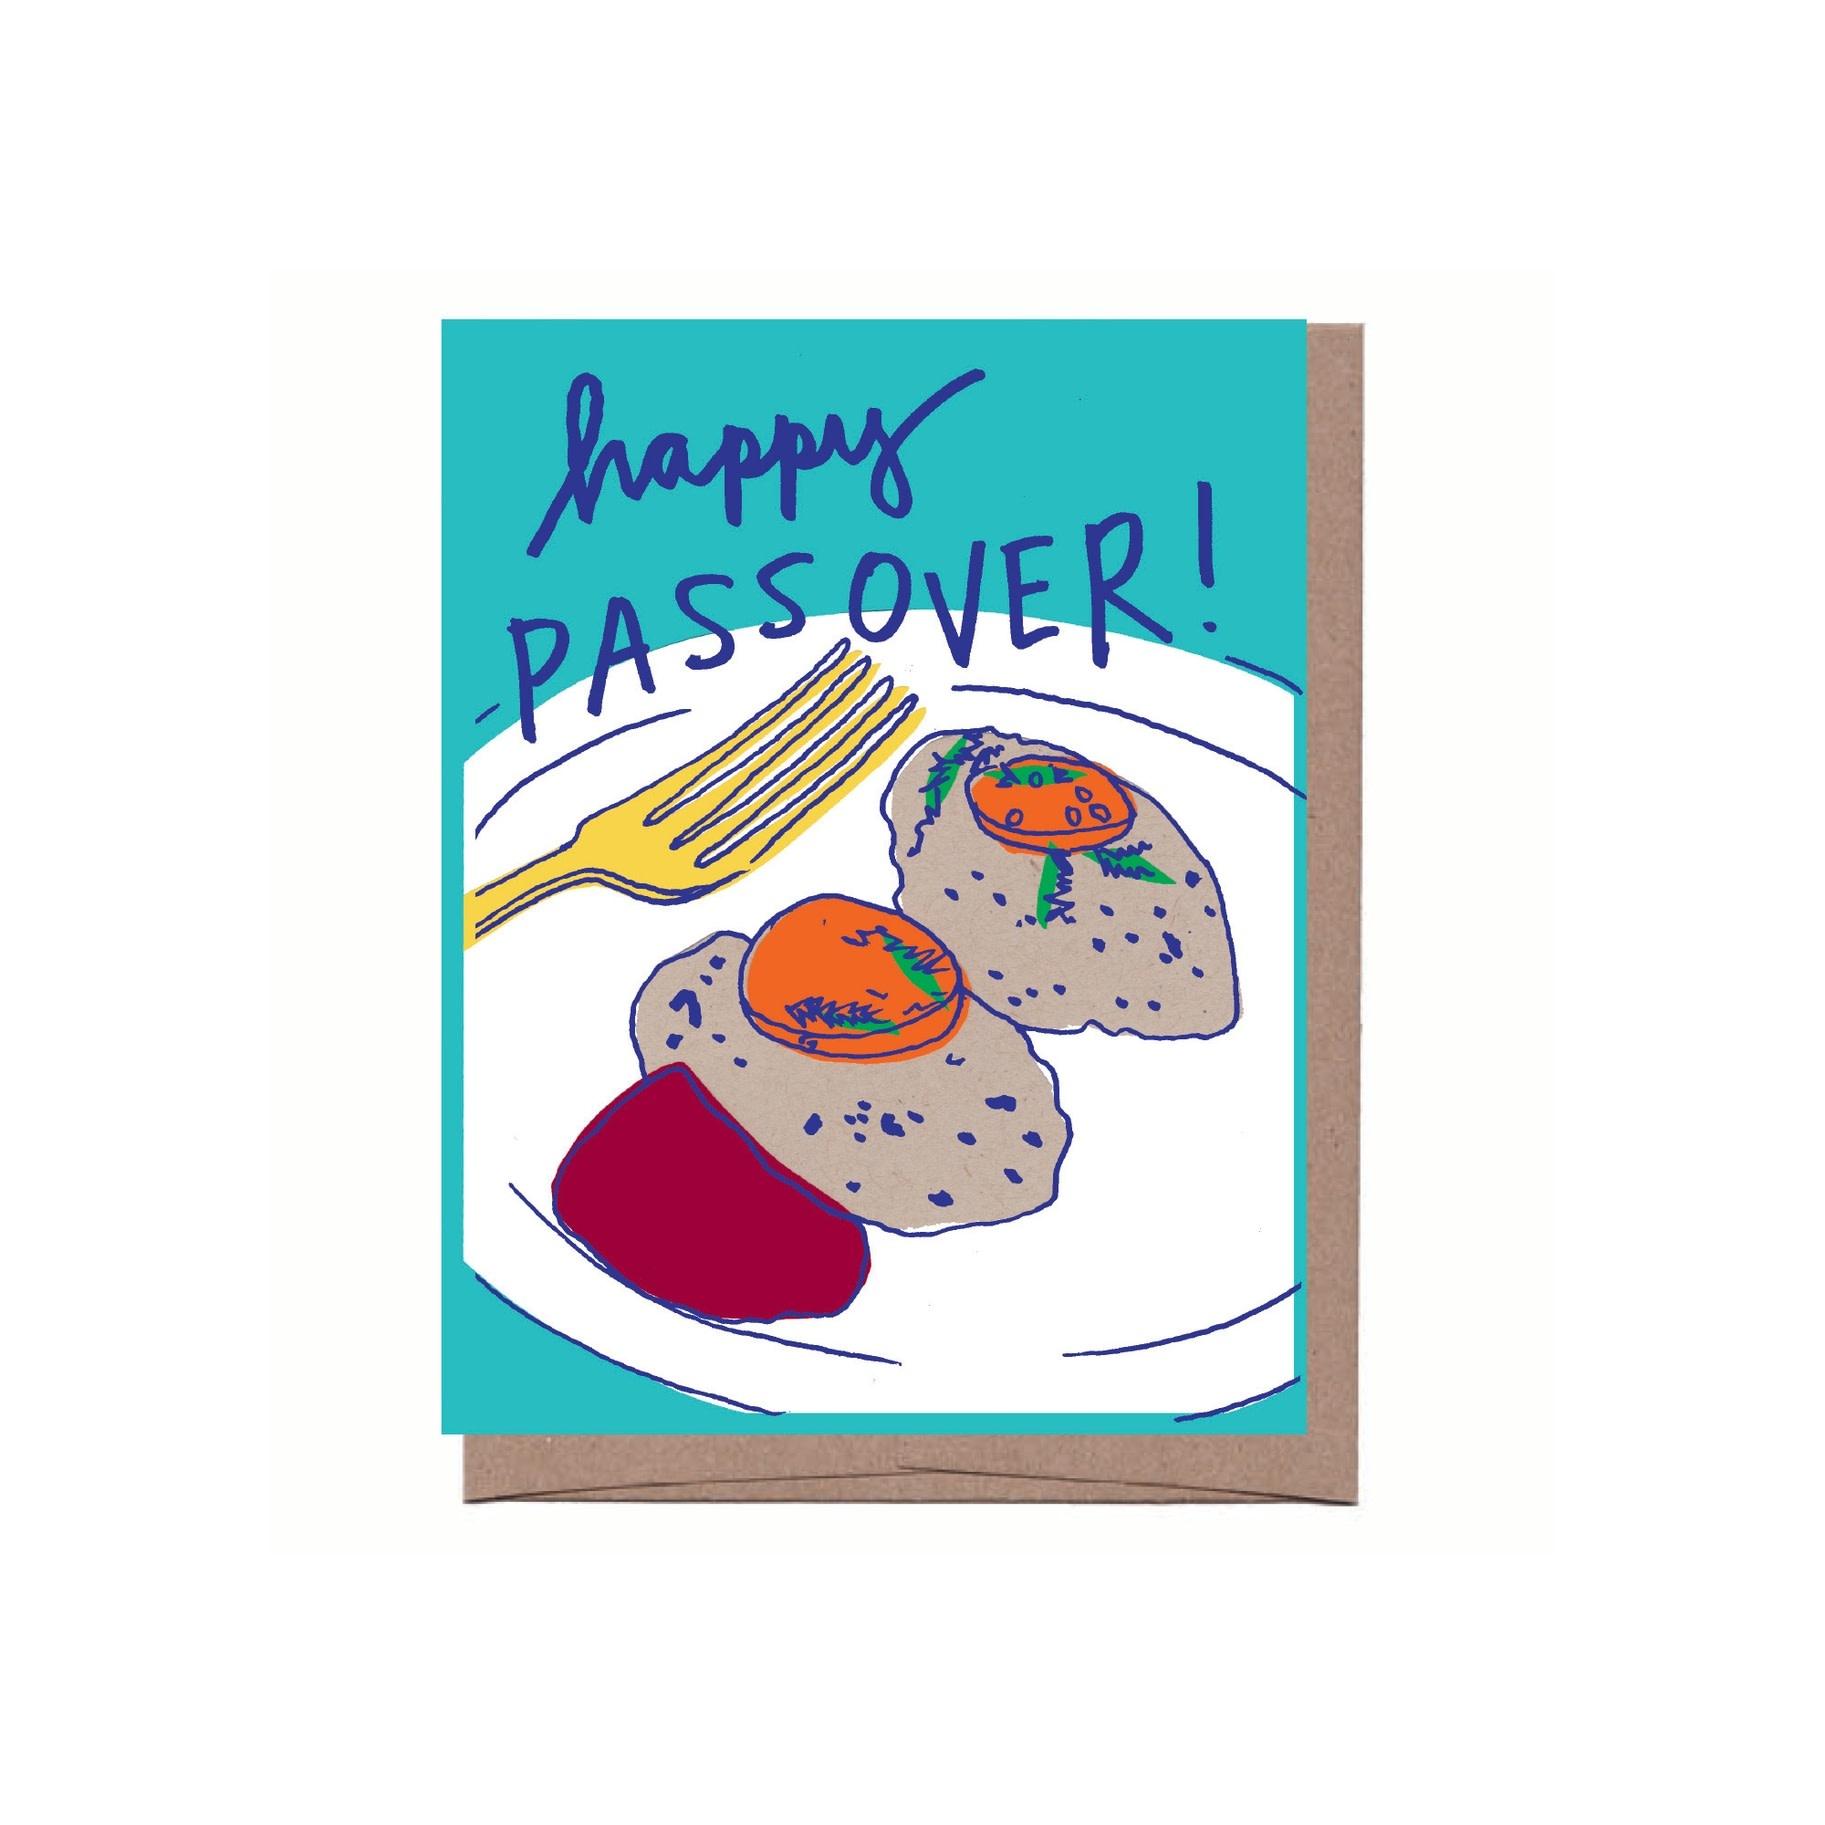 La Familia Green - LFG LFGGCSE0001 - Gefilte Fish Passover Card